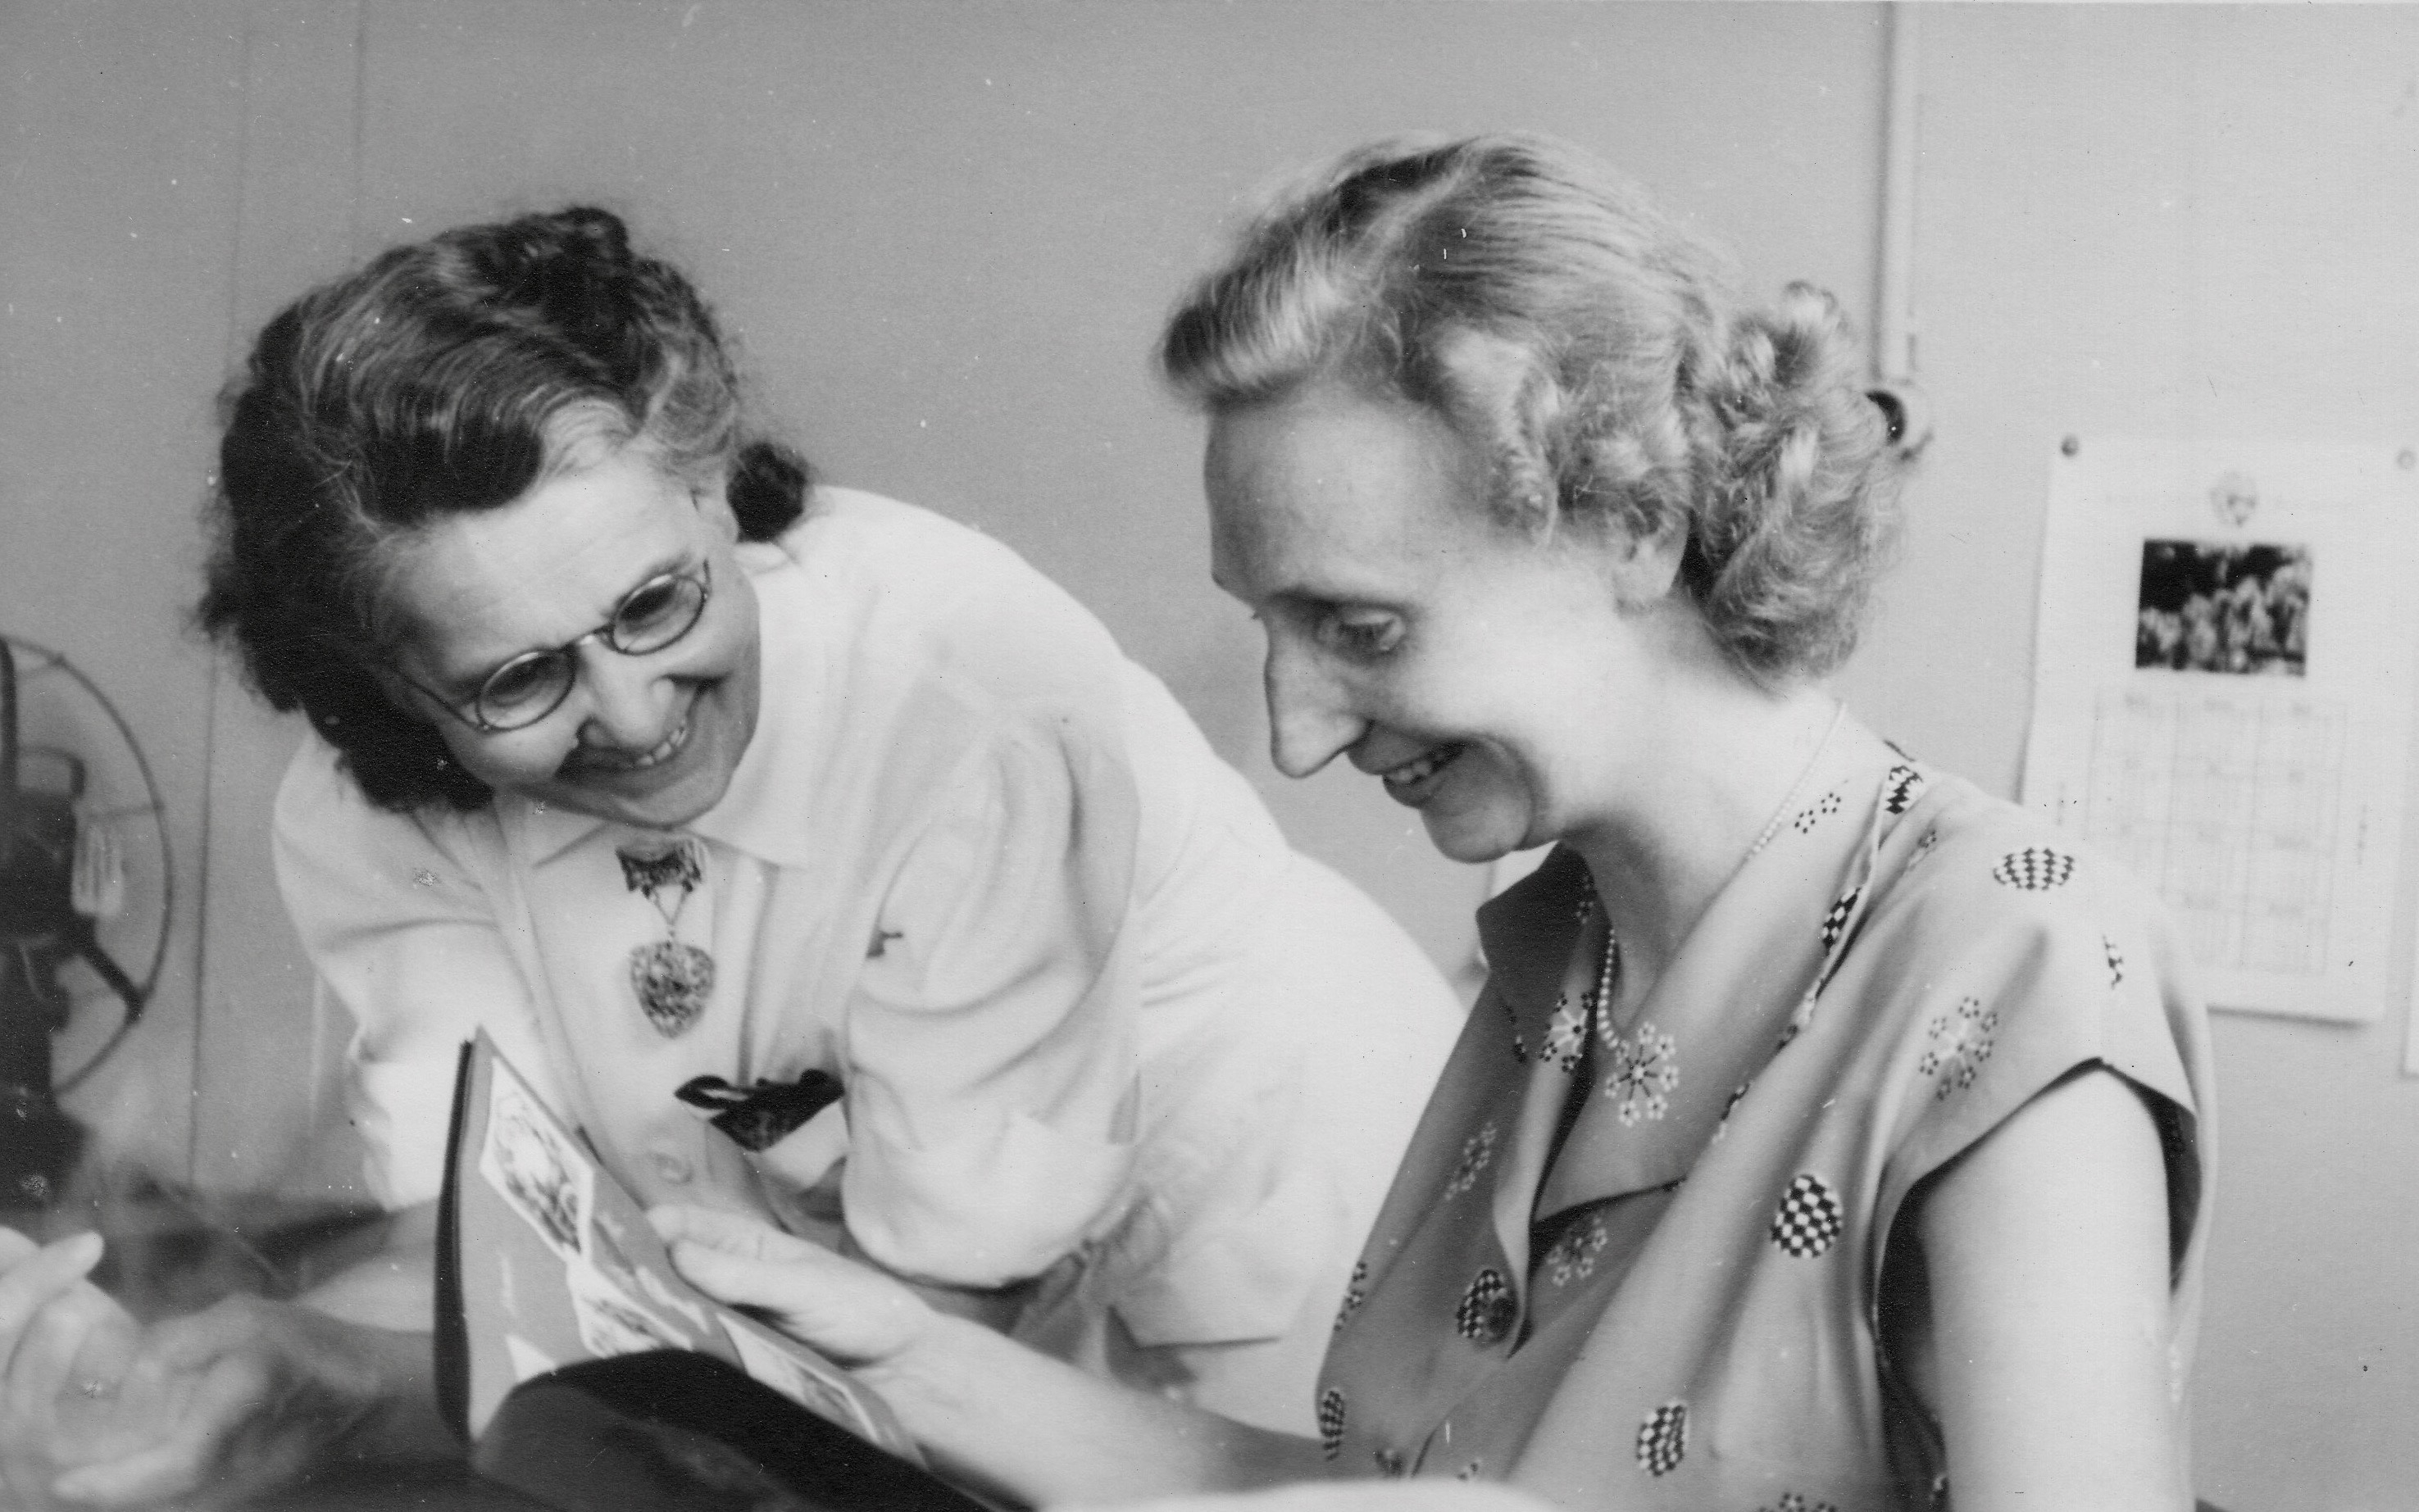 Trieste, Clare McMurray and Olga Benson 1951